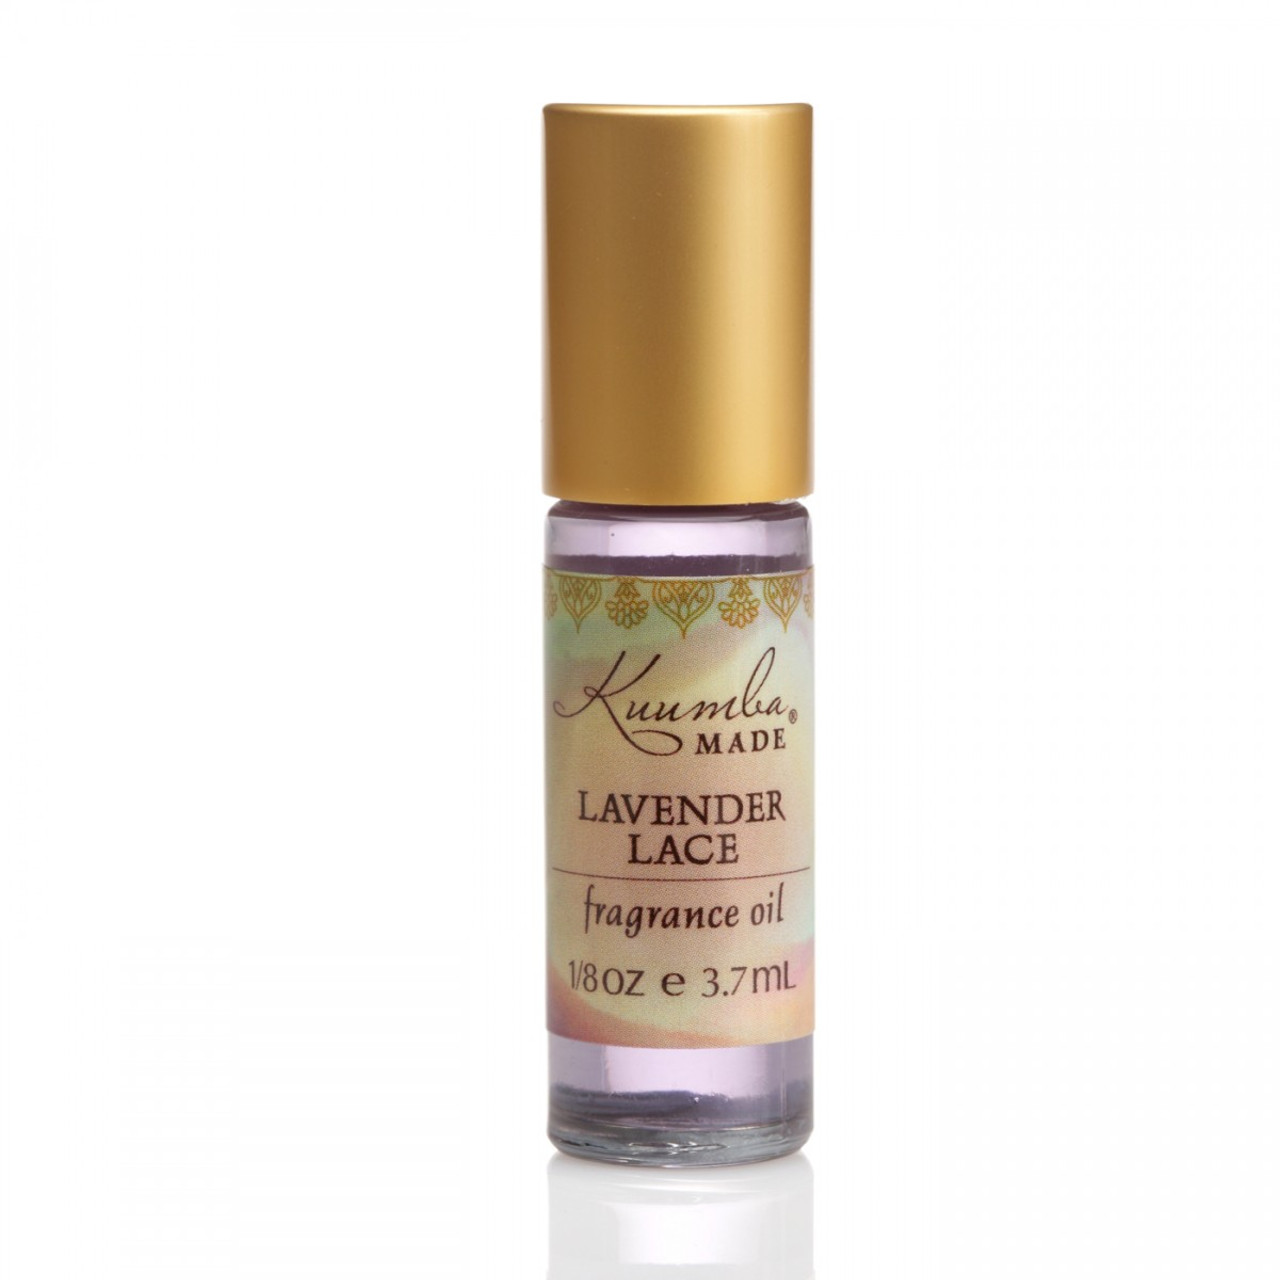 Kuumba Made Lavender Lace Fragrance Oil